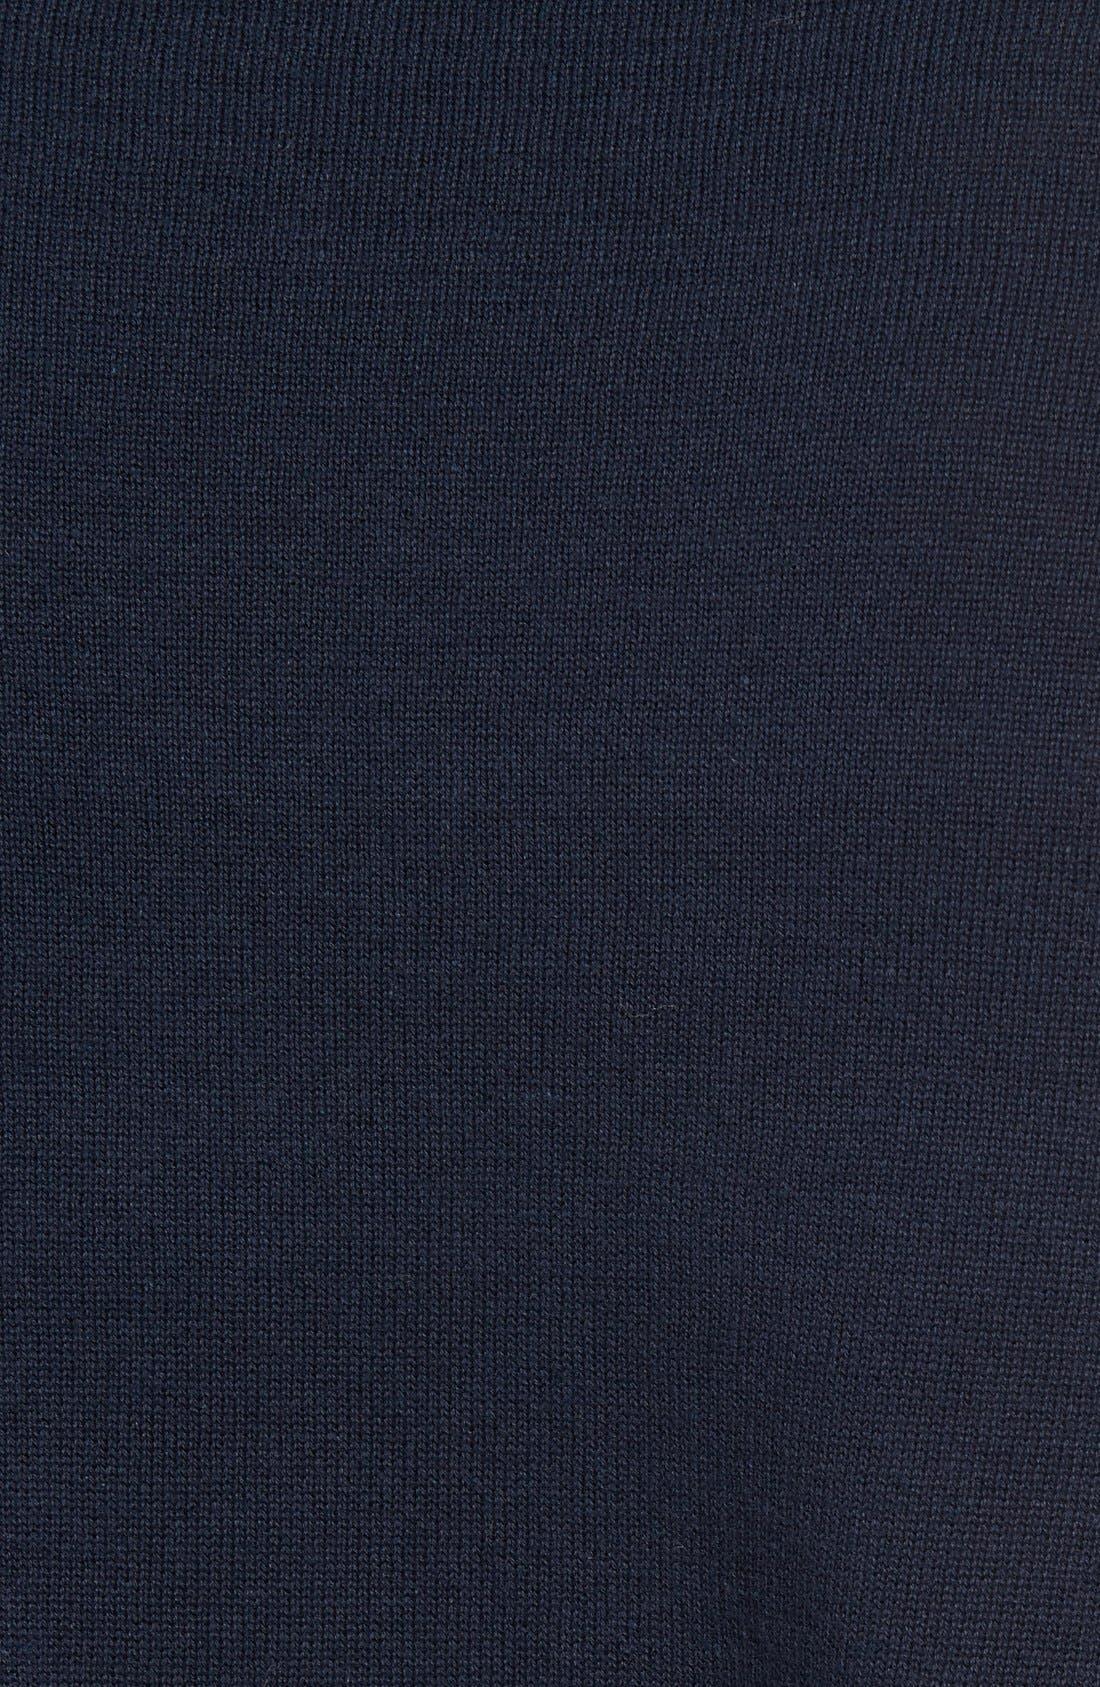 Nylon Trim Pullover,                             Alternate thumbnail 15, color,